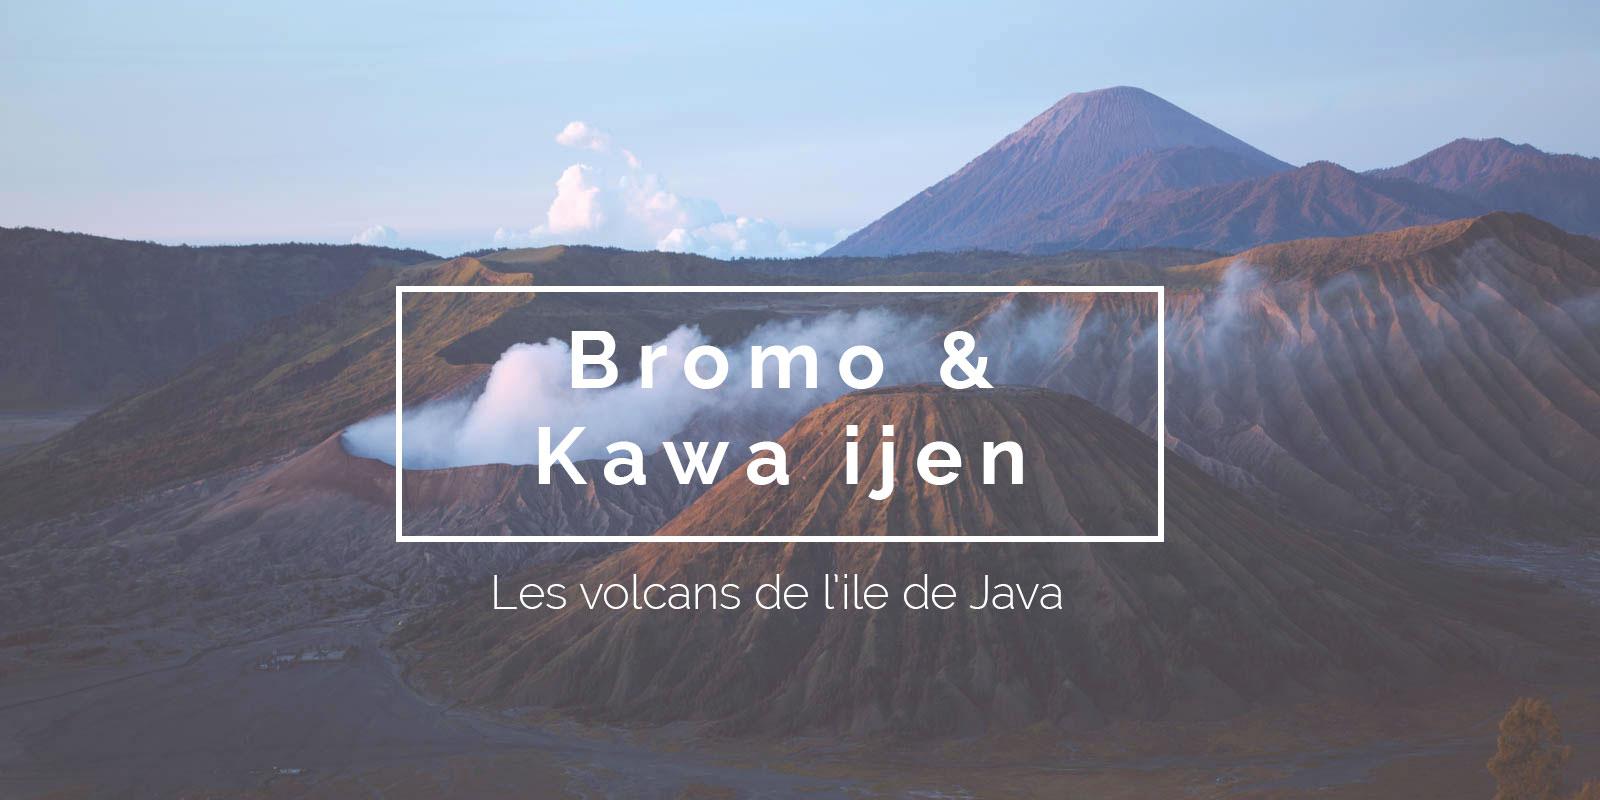 Bromo Kawa ijen title